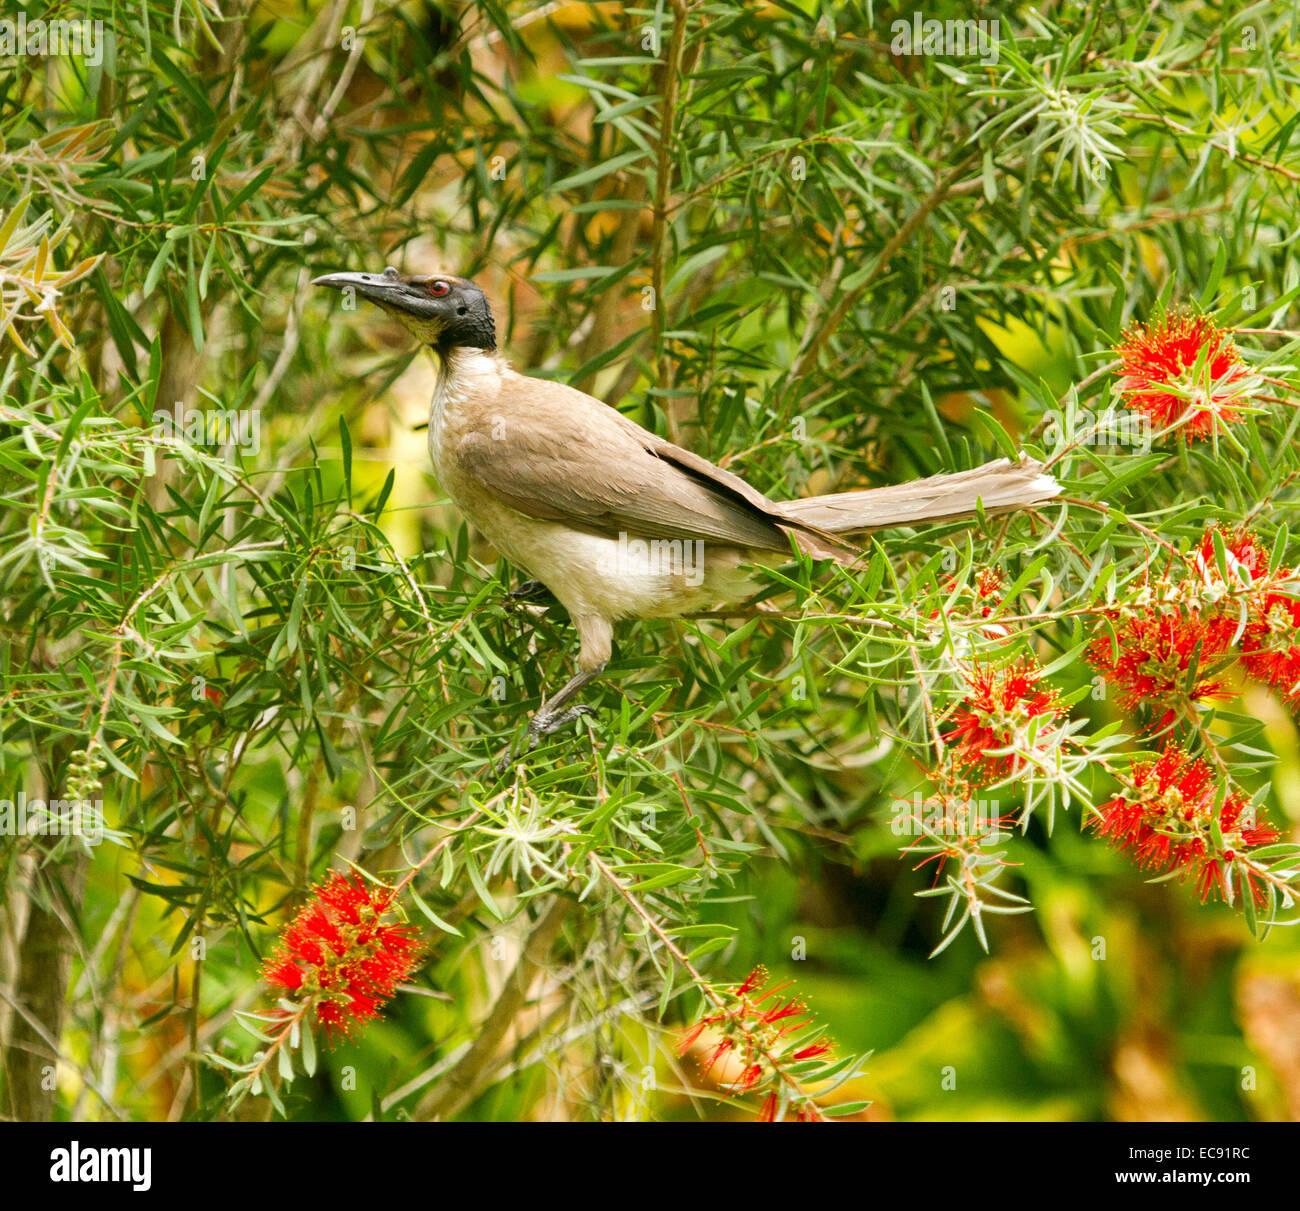 Noisy friar bird, Philemon corniculatus, Australian honeyeater feeding on red flowers of native bottlebrush / Callistemon - Stock Image